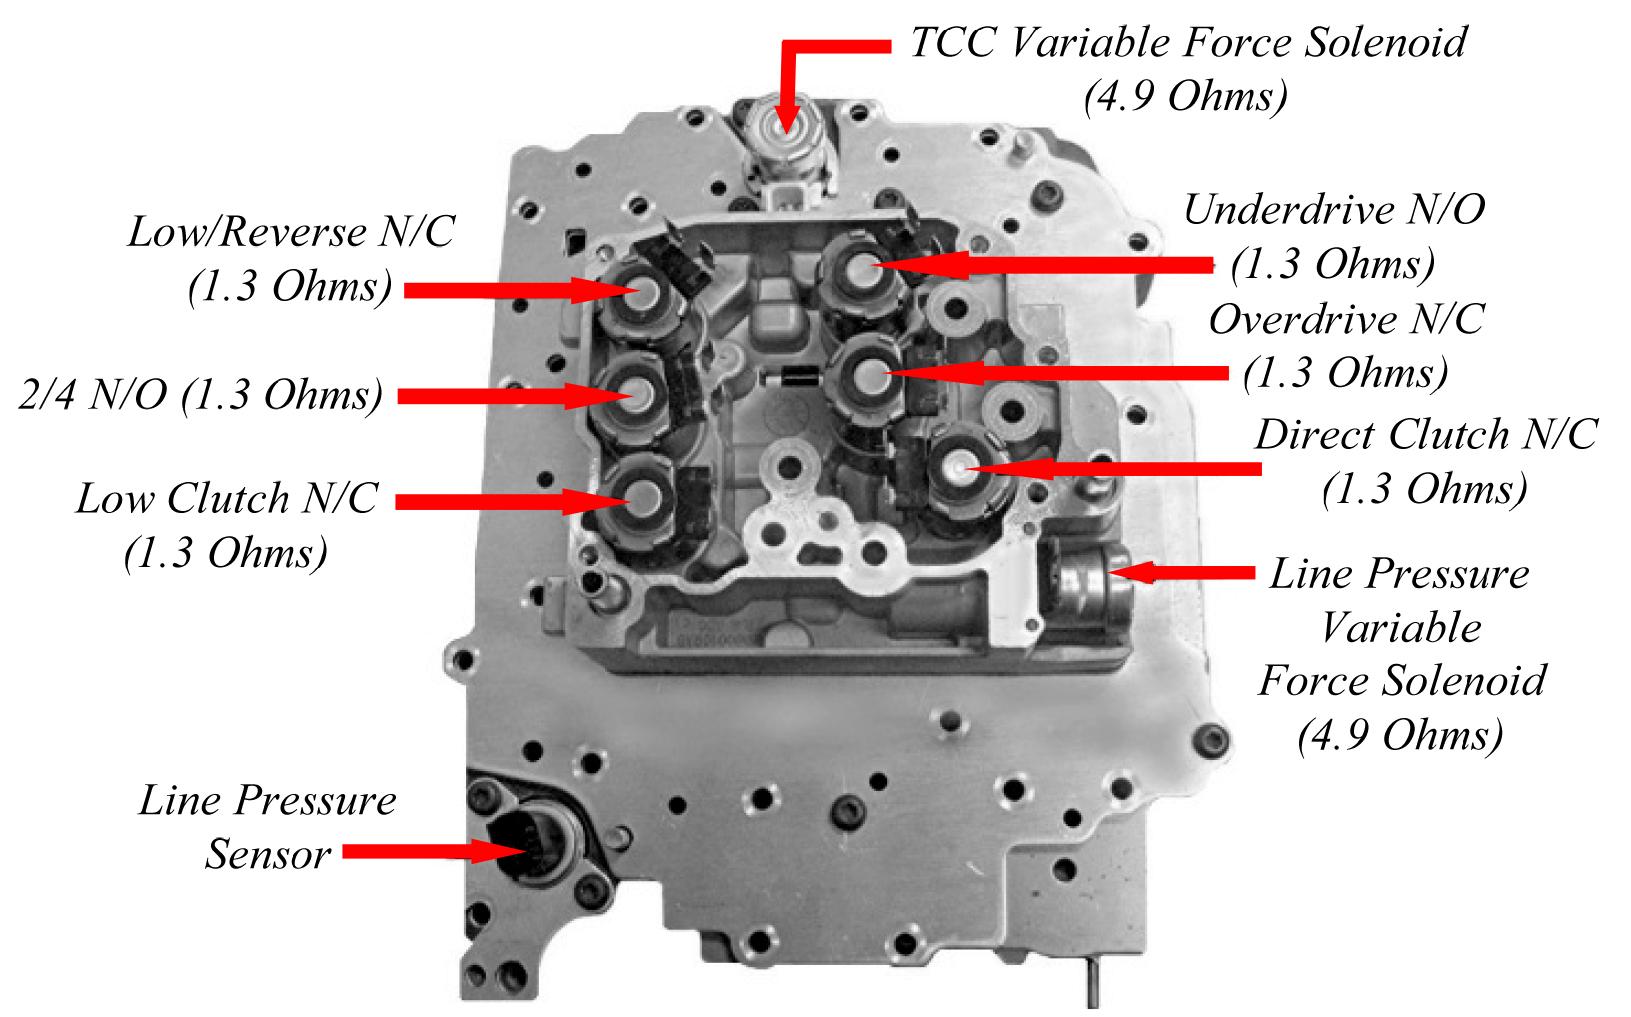 62te Transmission Diagram | Wiring Diagrams